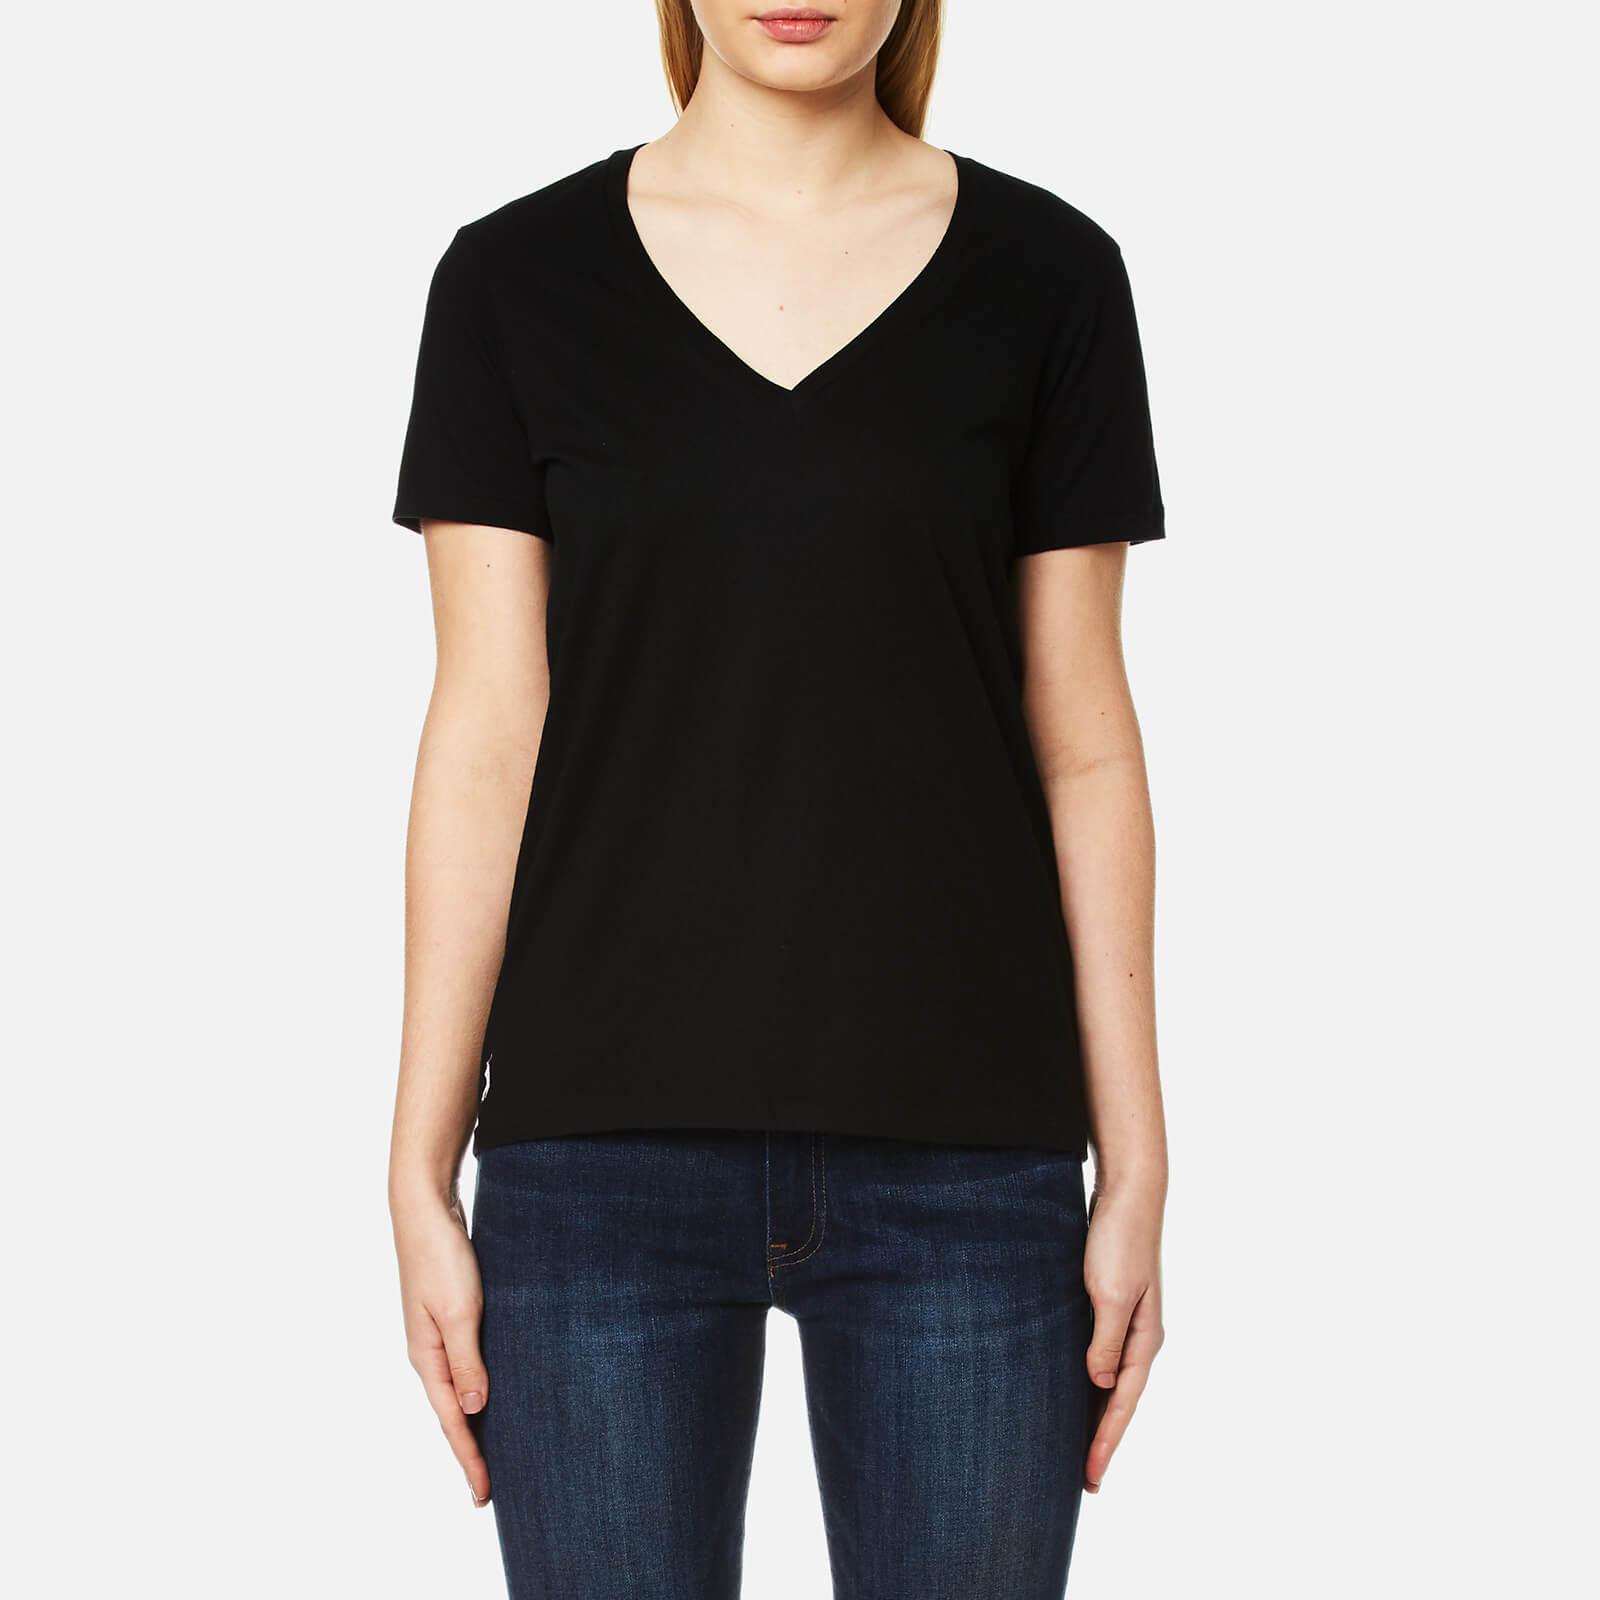 Polo ralph lauren t shirts women the for V neck black t shirt women s